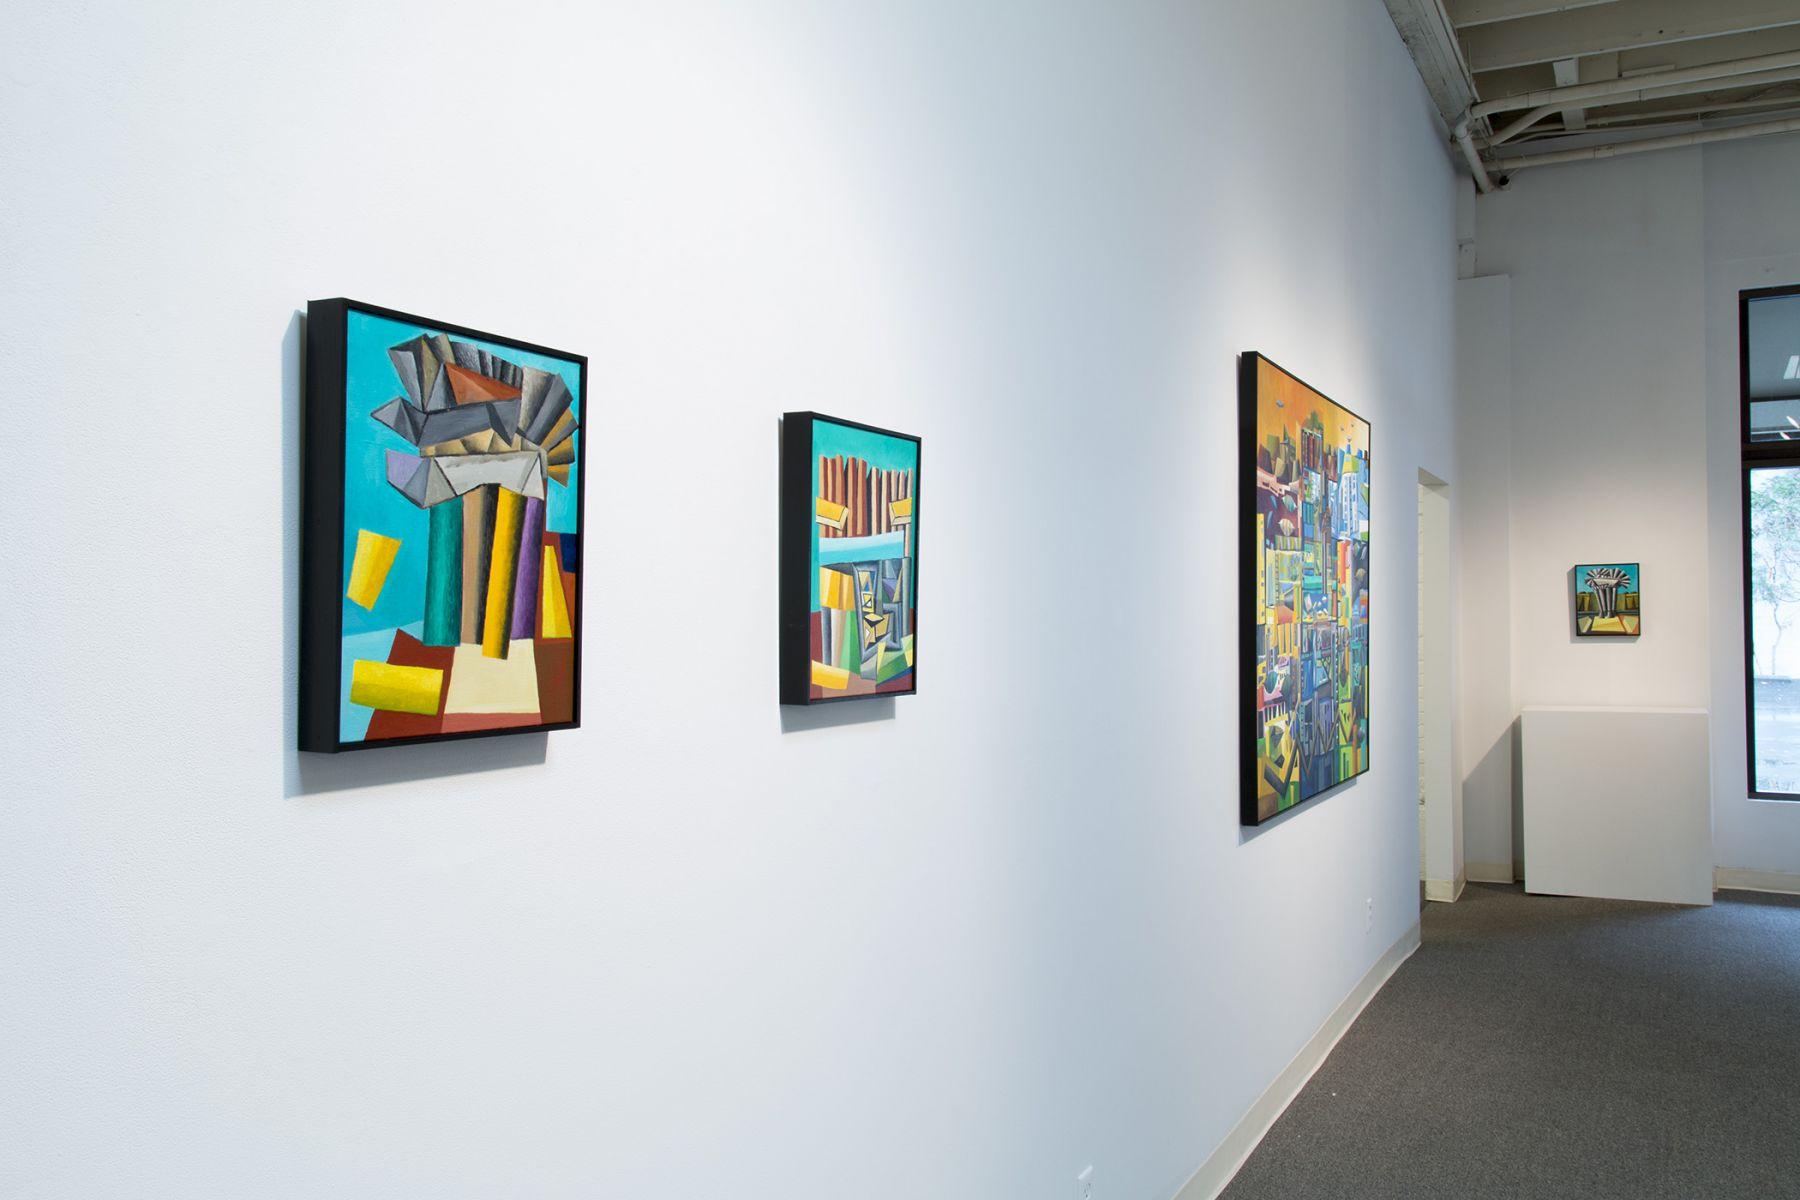 Jackie K. Johnson Installation View March 2016